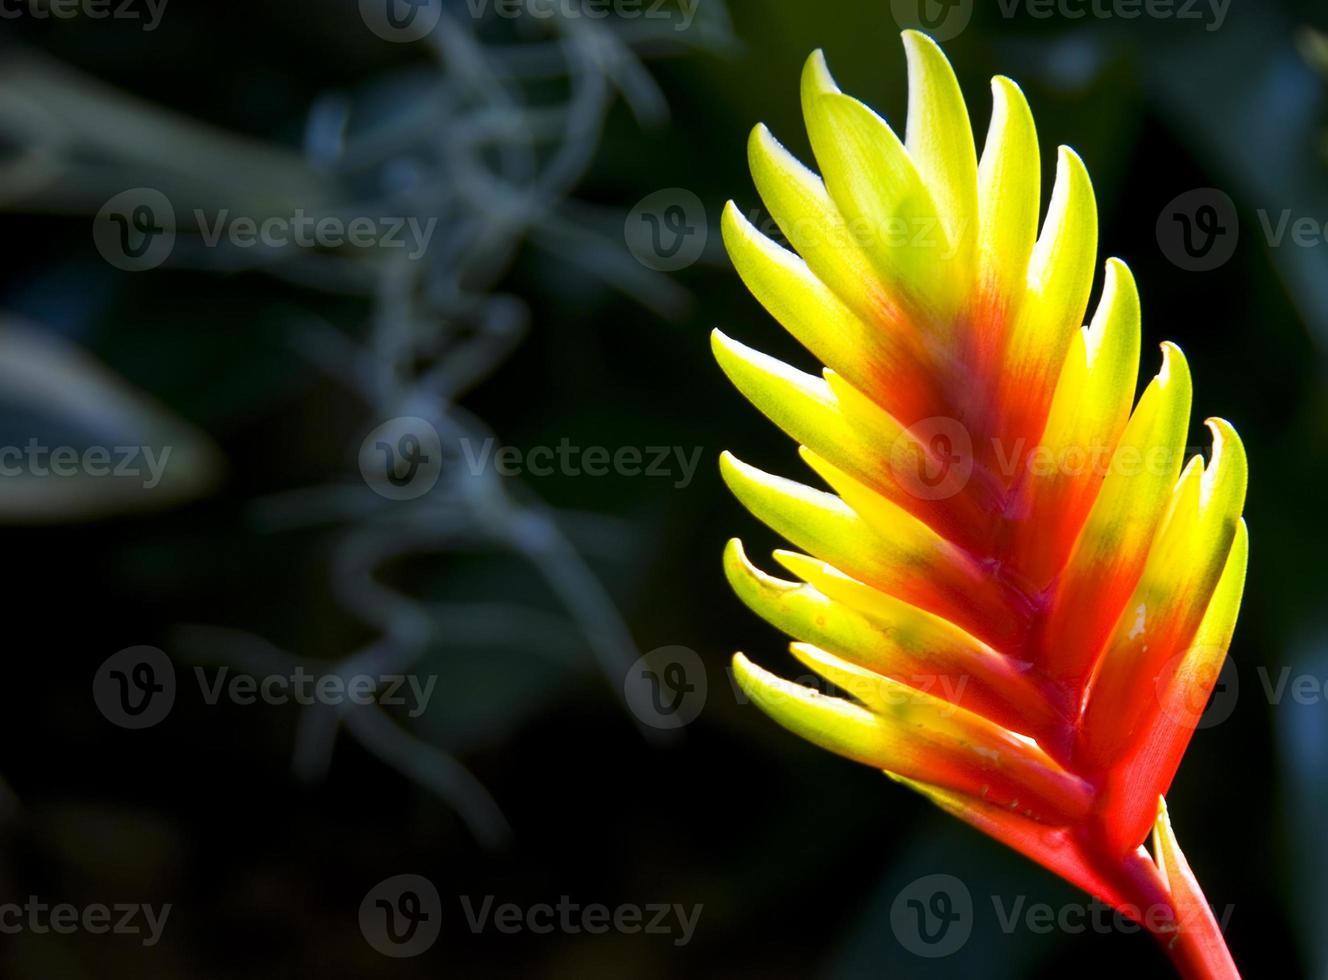 kreeft-klauwplant (heliconia rostrata) foto